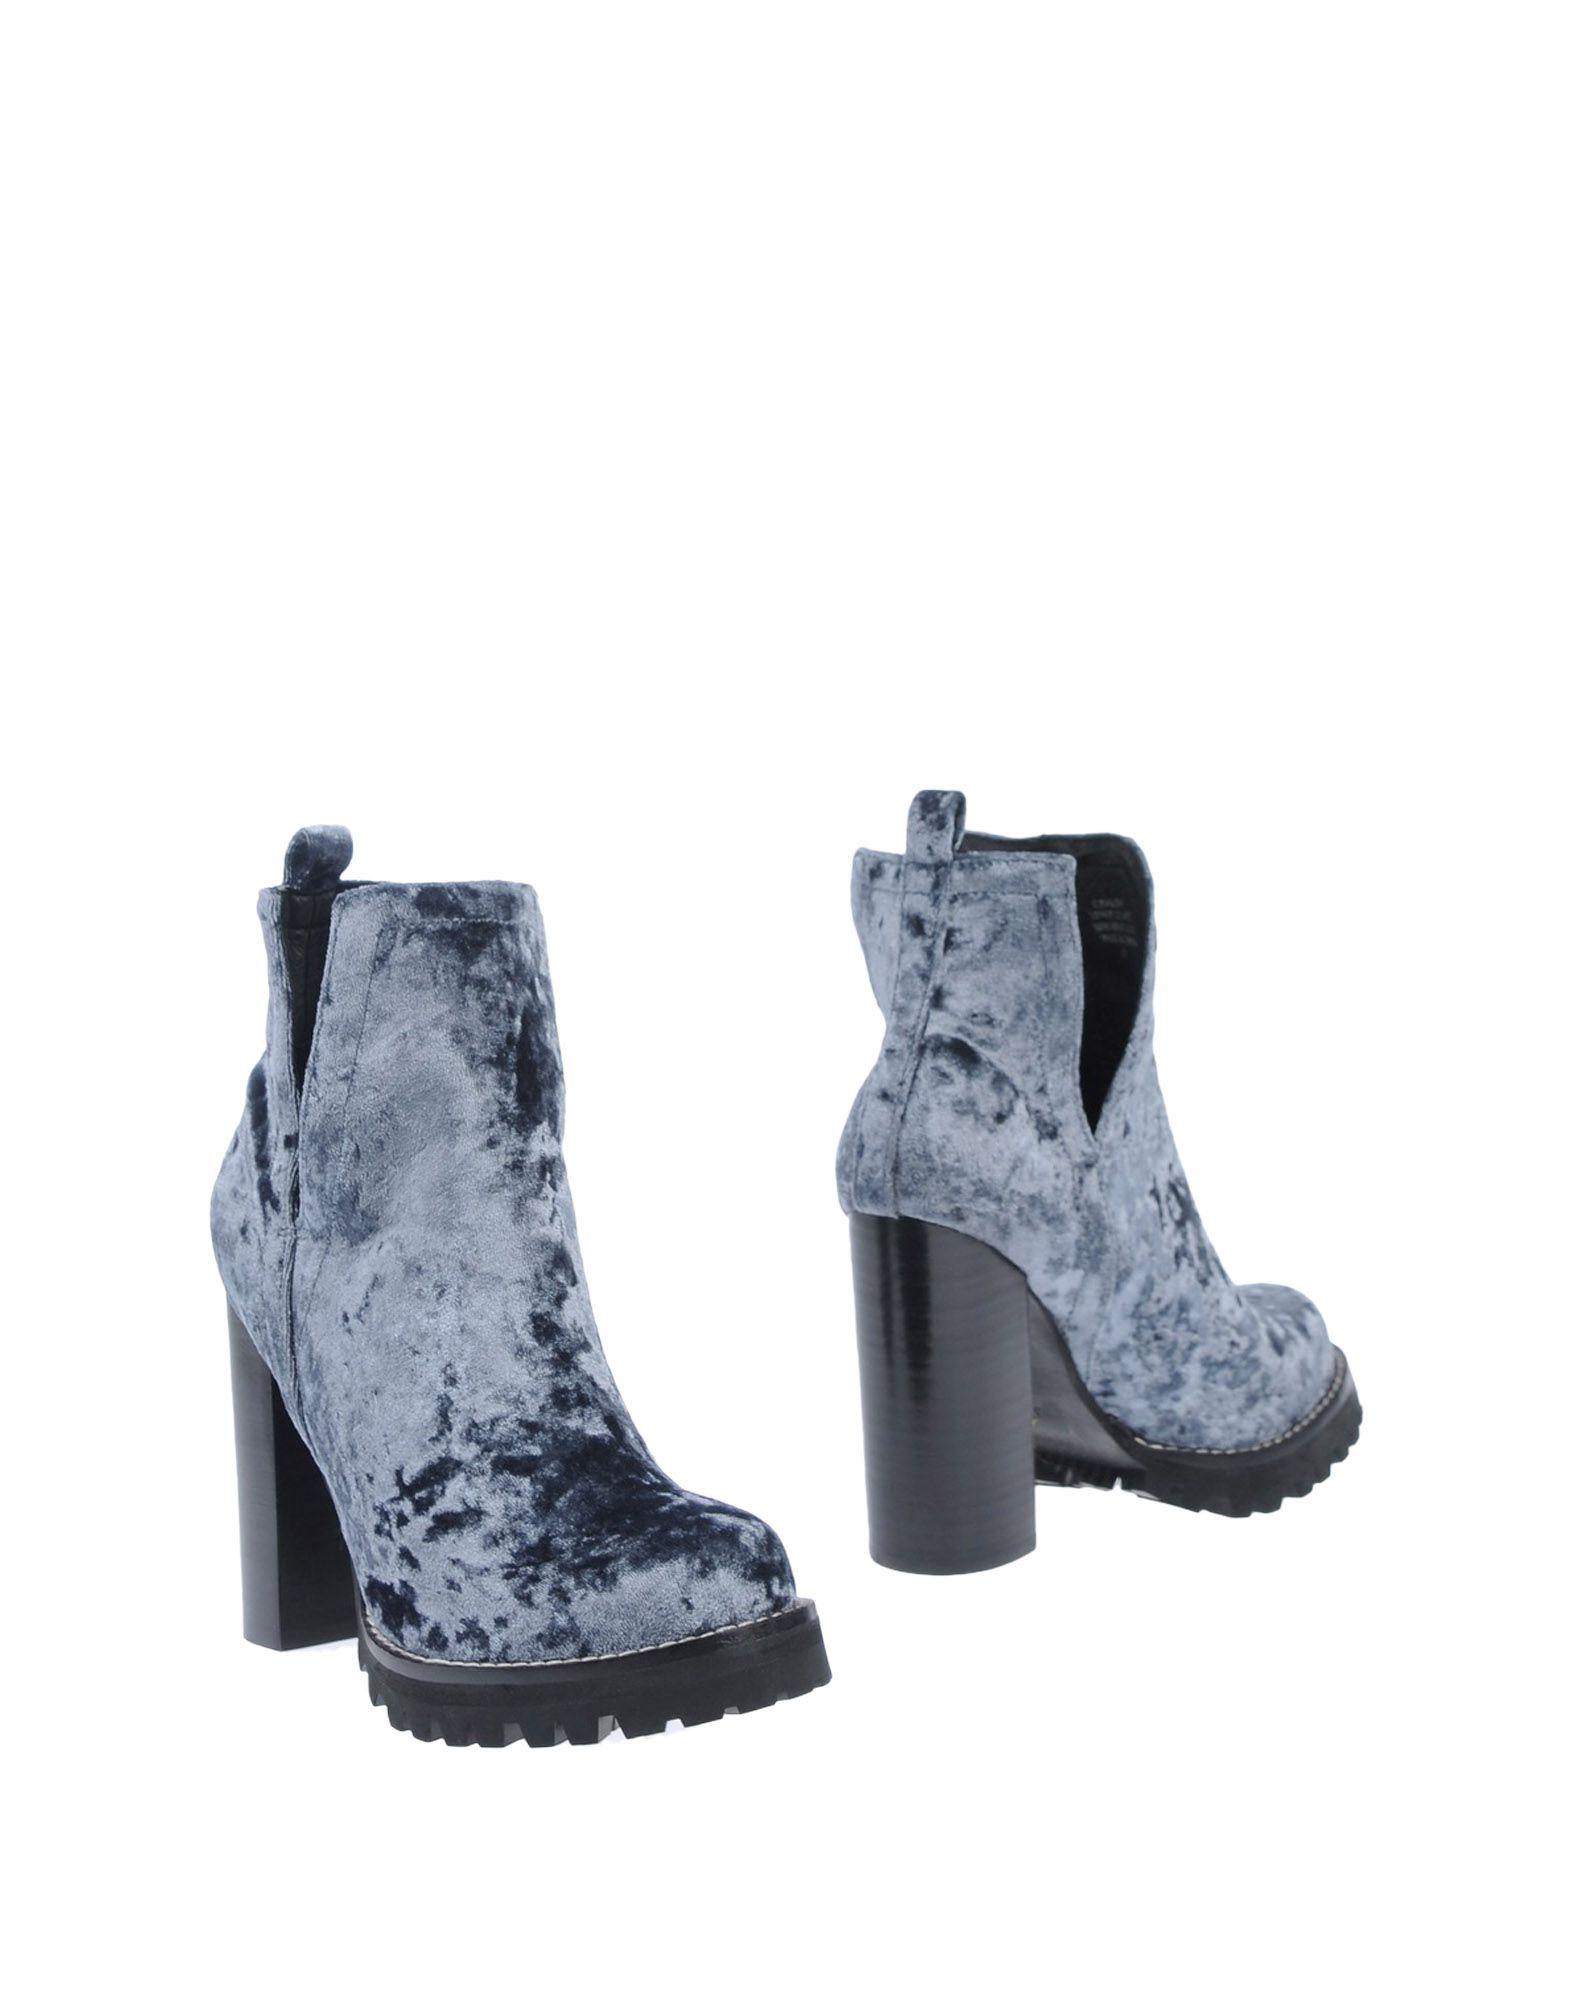 Jeffrey Campbell Stiefelette Damen  11508850BS Gute Schuhe Qualität beliebte Schuhe Gute 2f43ef